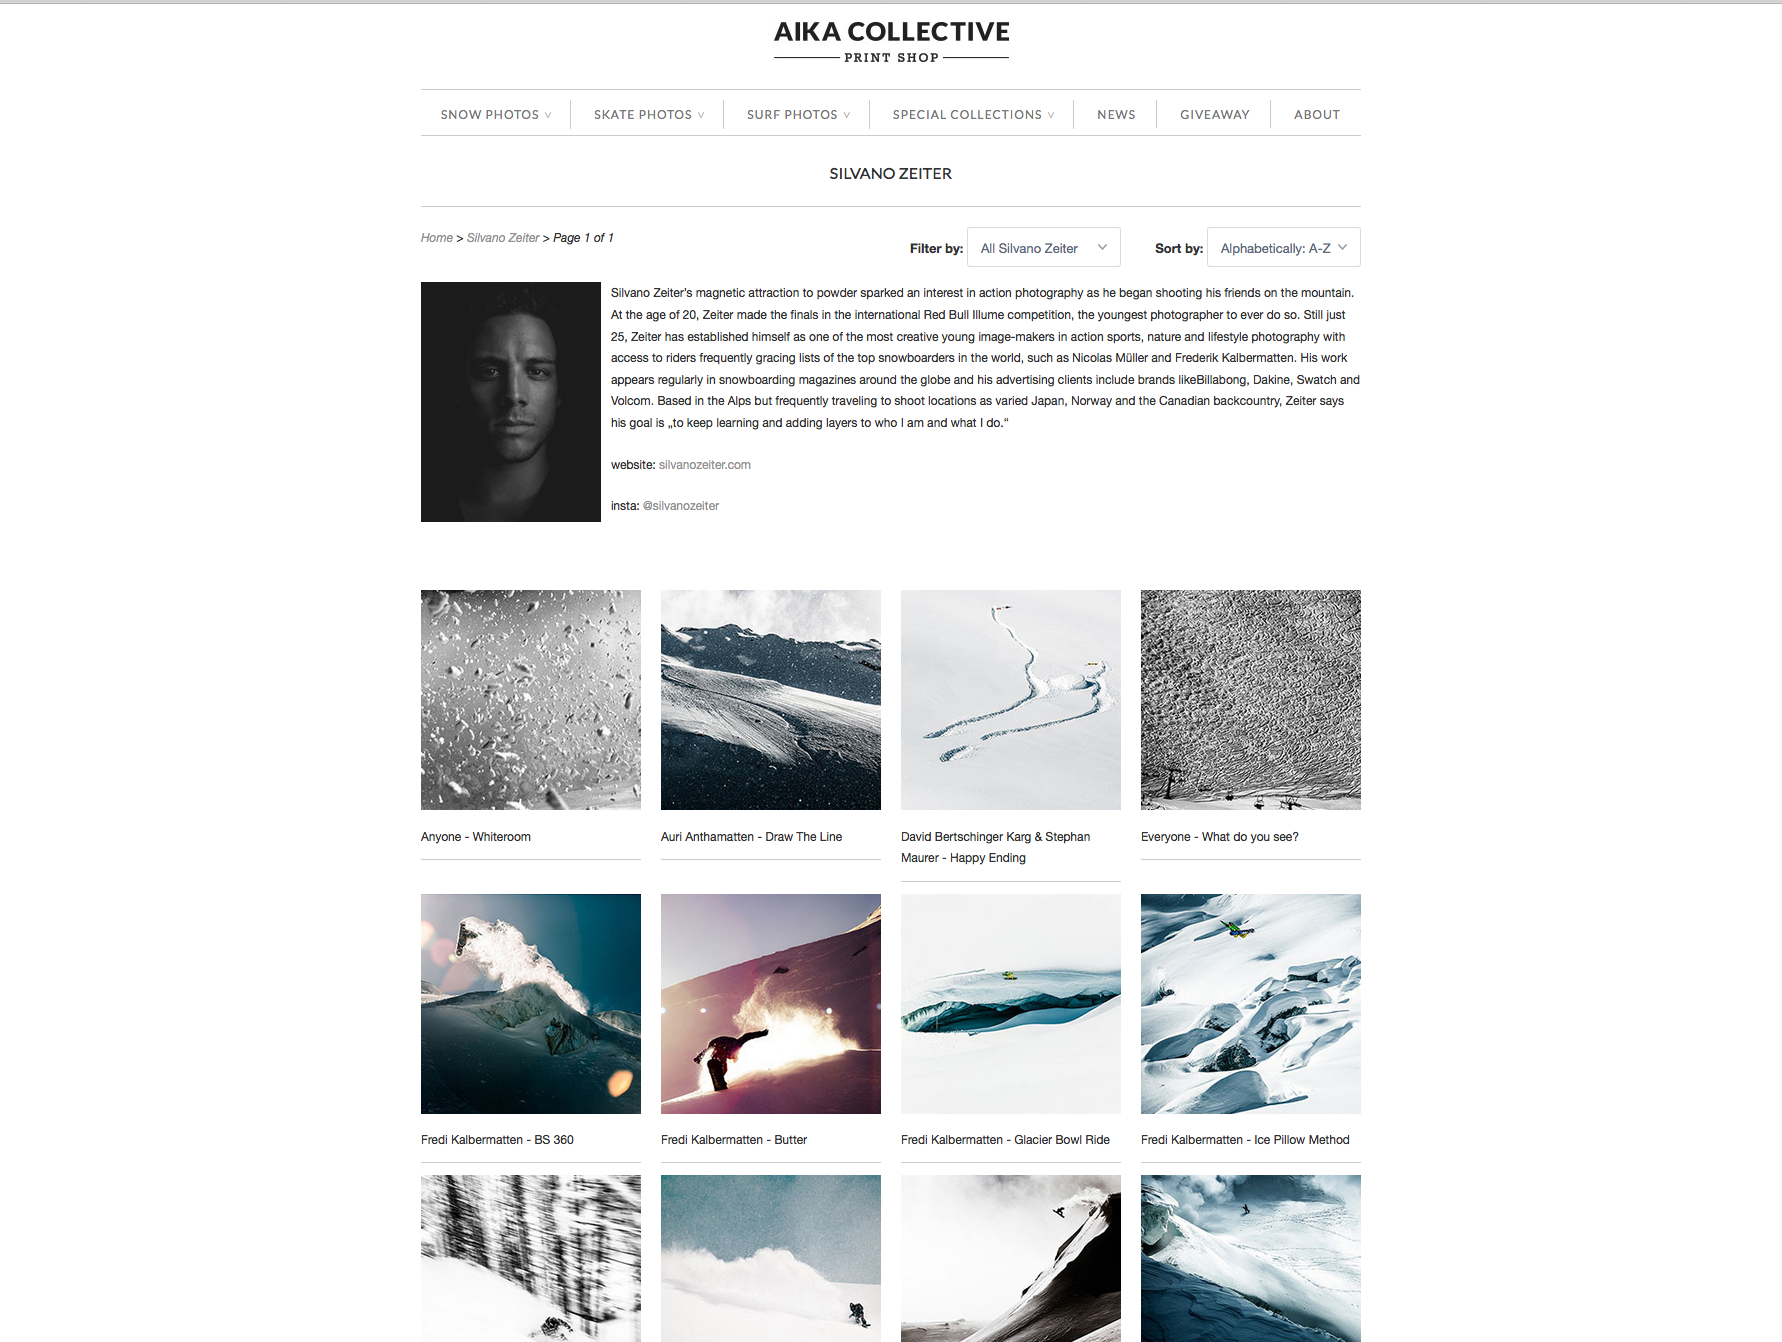 aikacollective_photo_print_shop_silvanozeiter